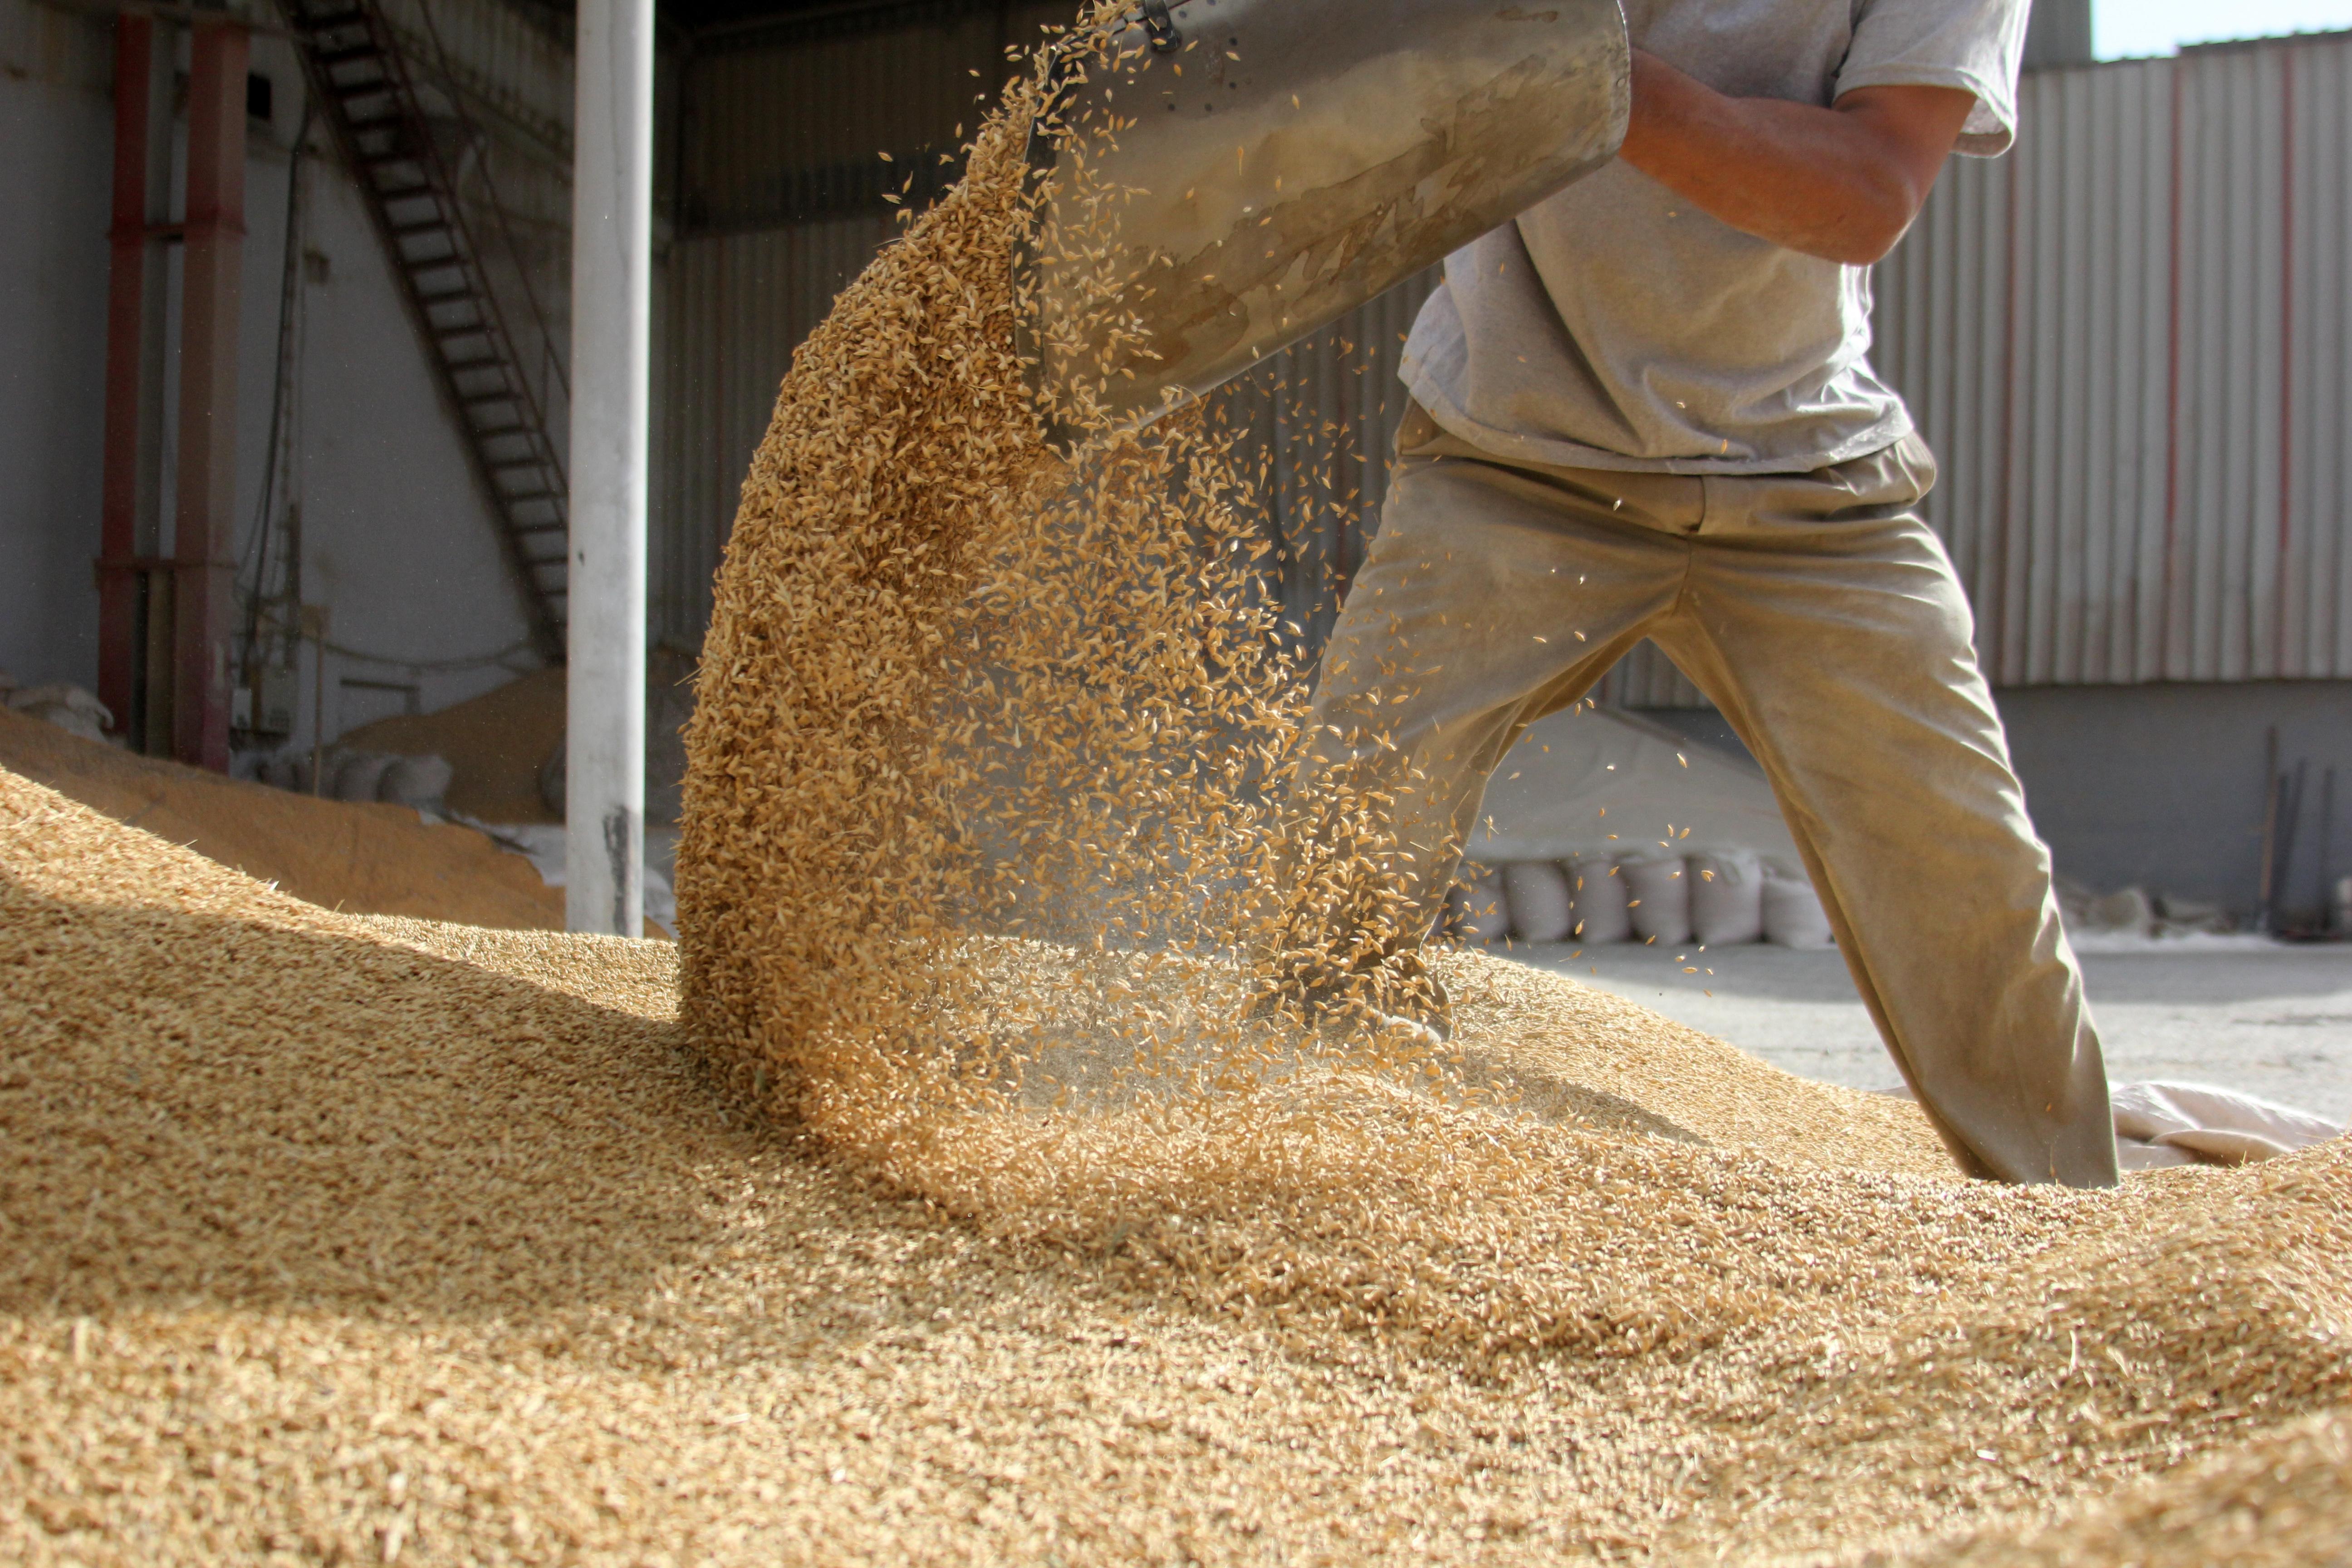 Grain-moving_adobestock_26233990